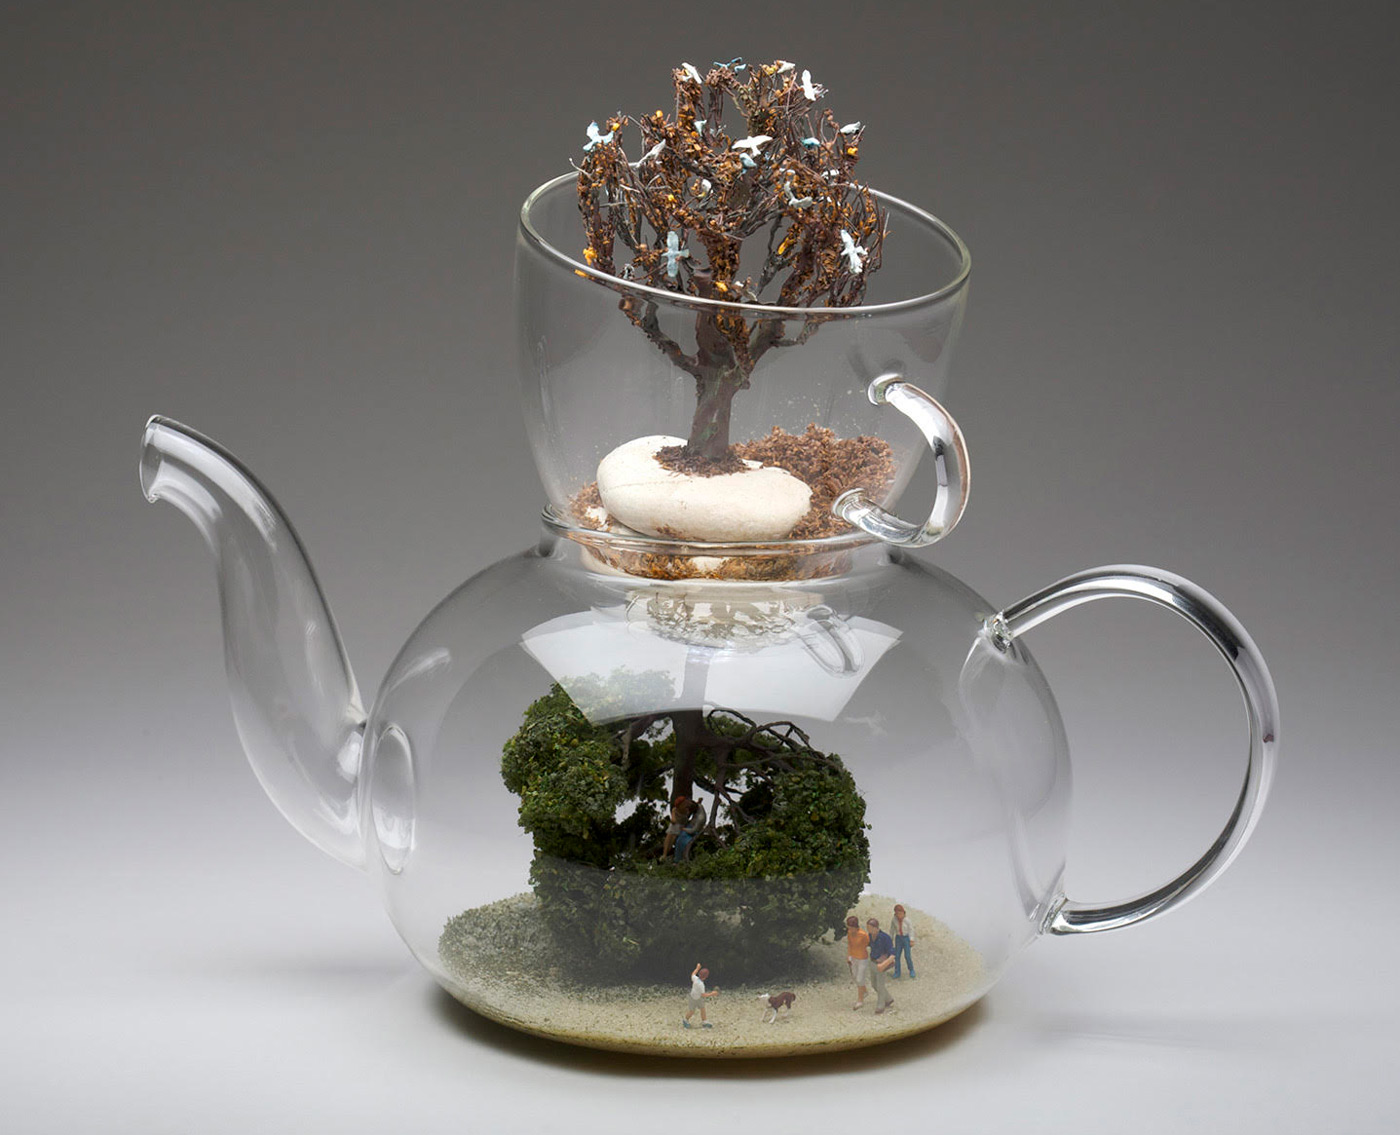 kendal-murray-miniatur-szobrai-noko-08.jpg